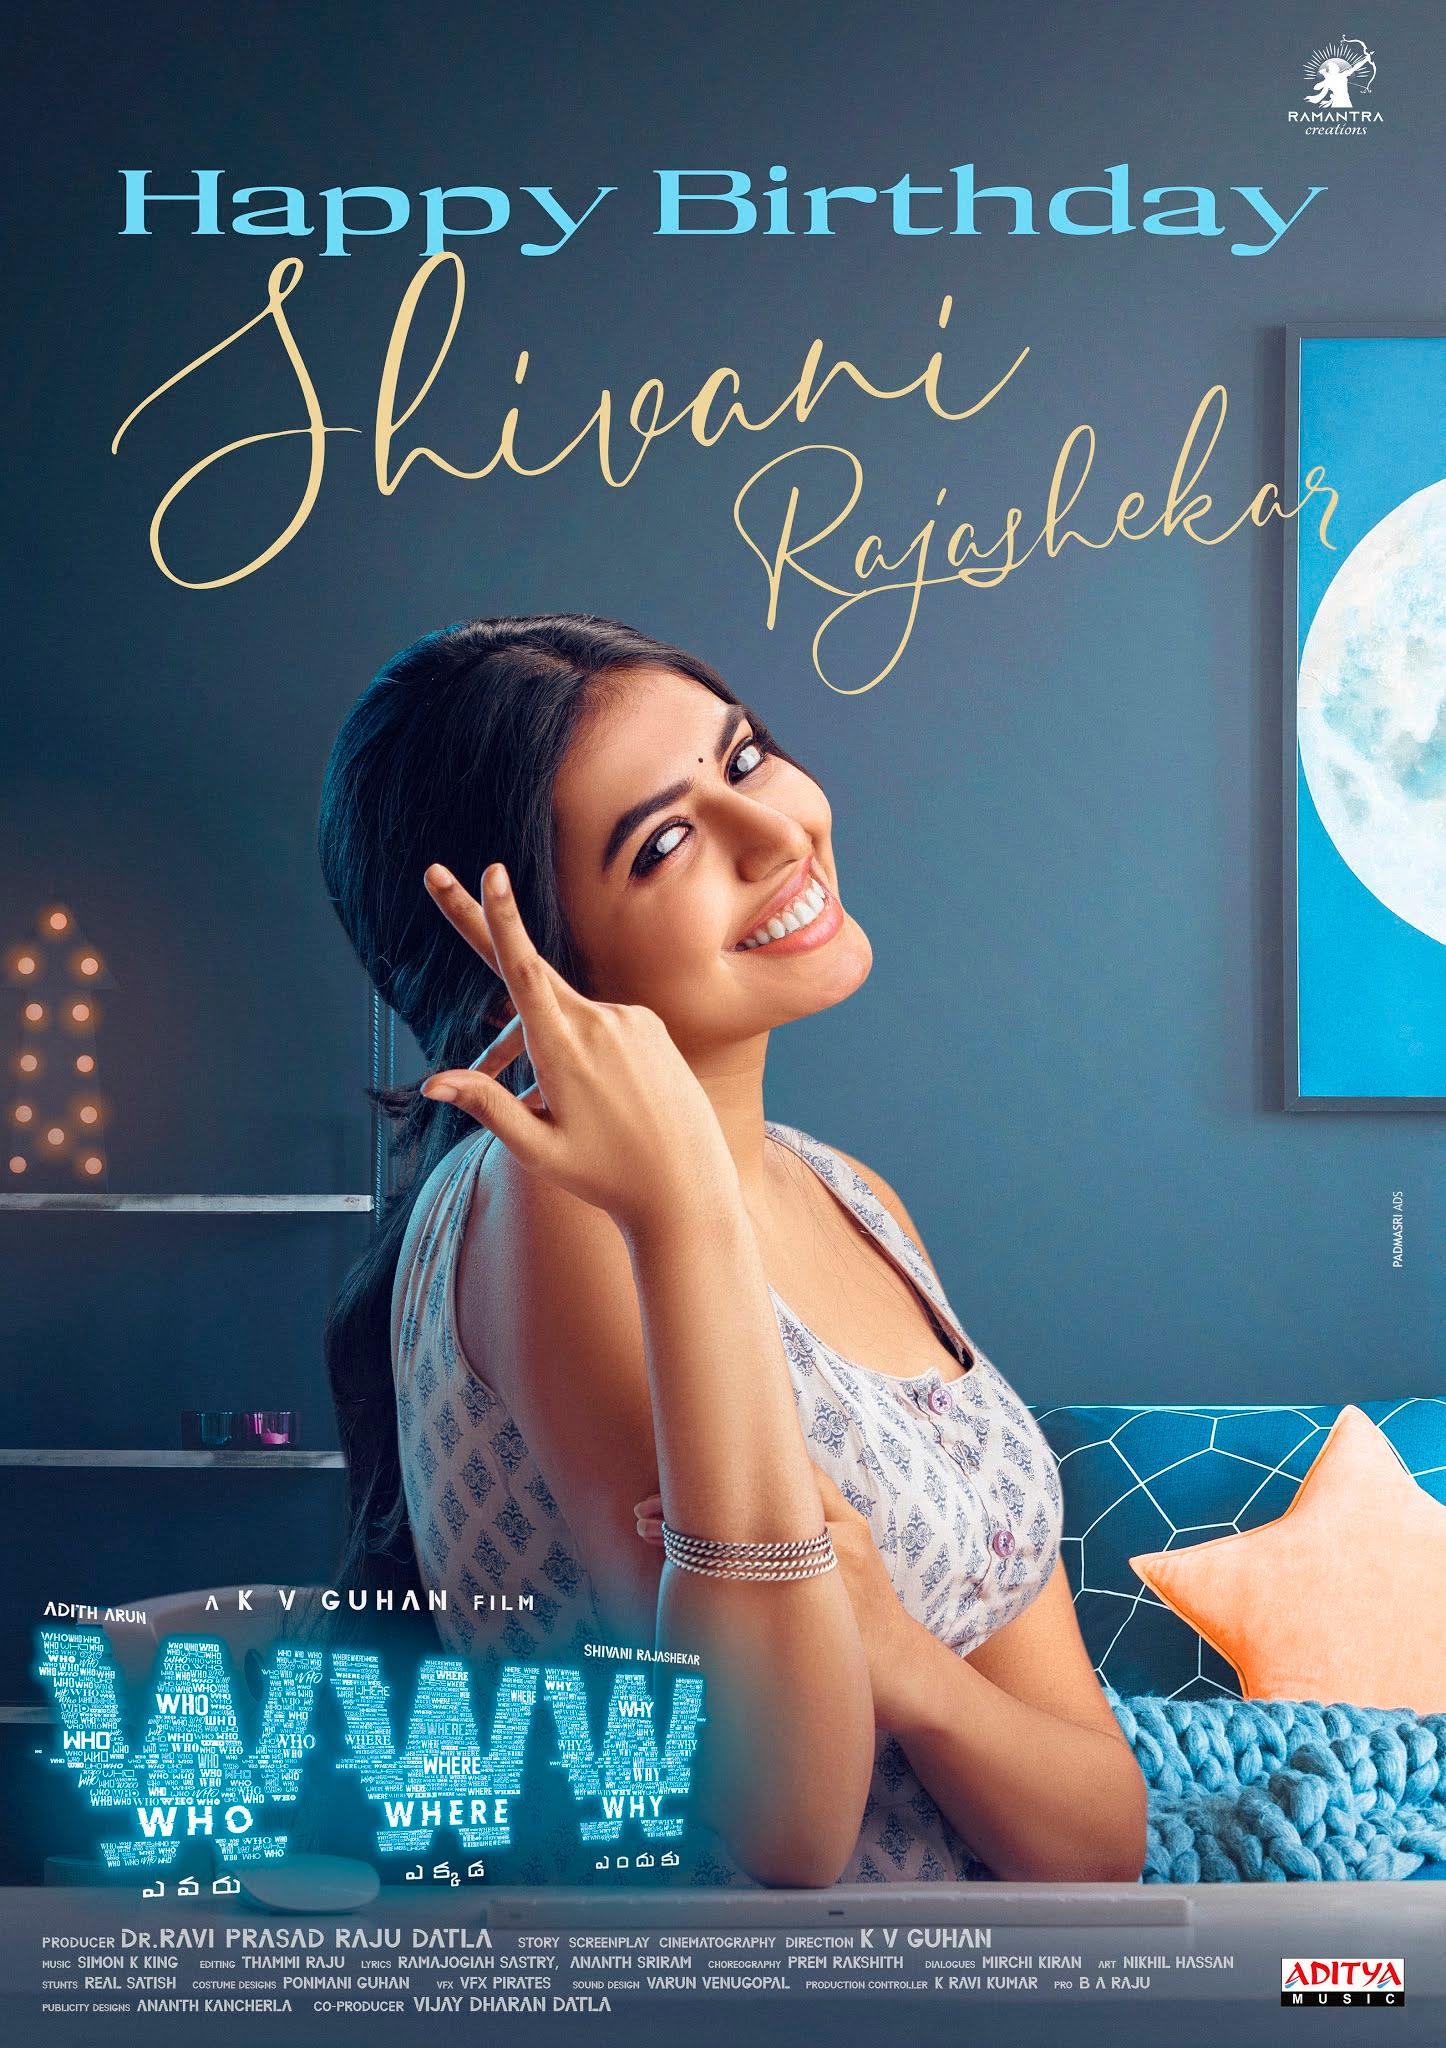 WWW Team Wishing Heroine Shivani Rajashekar With The Special Birthday Poster